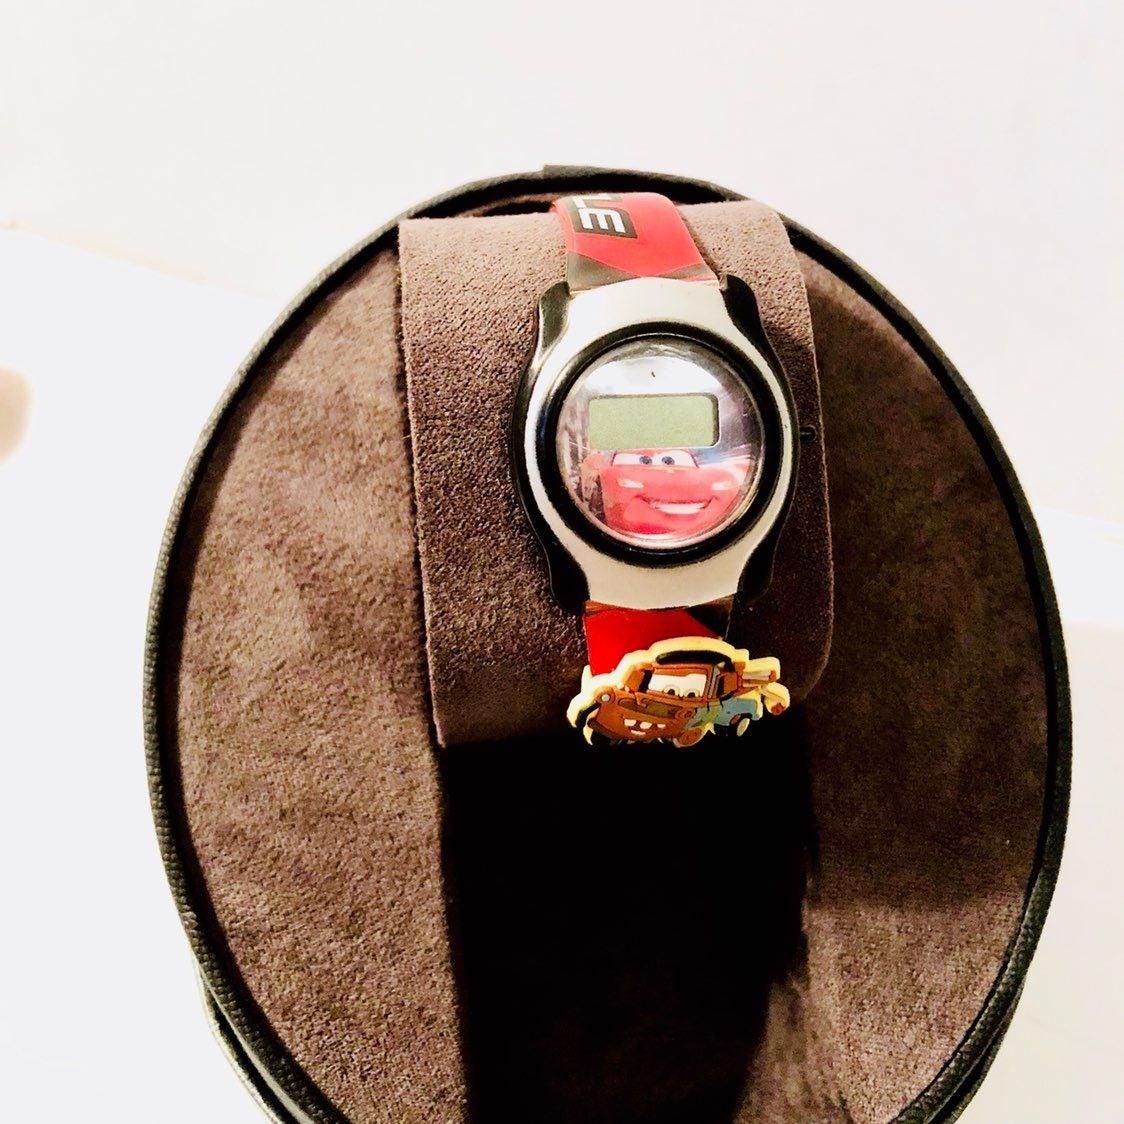 Disney Cars Digital LCD Mcqueen Watch